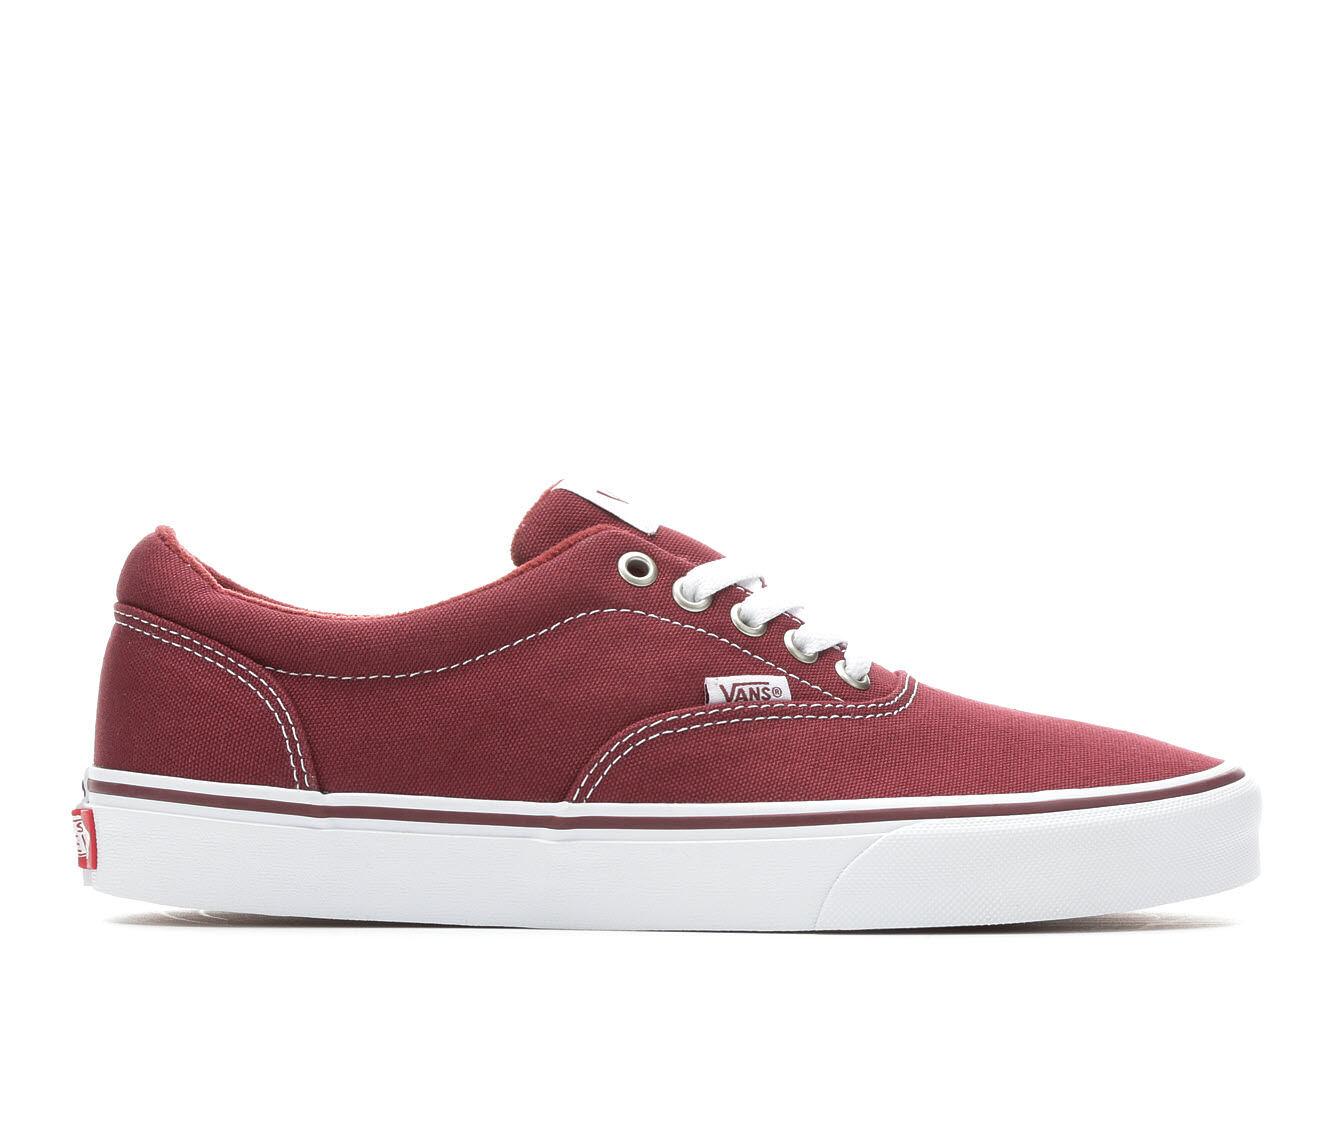 Vans Doheny Men's Skate Shoes pS0HDhi